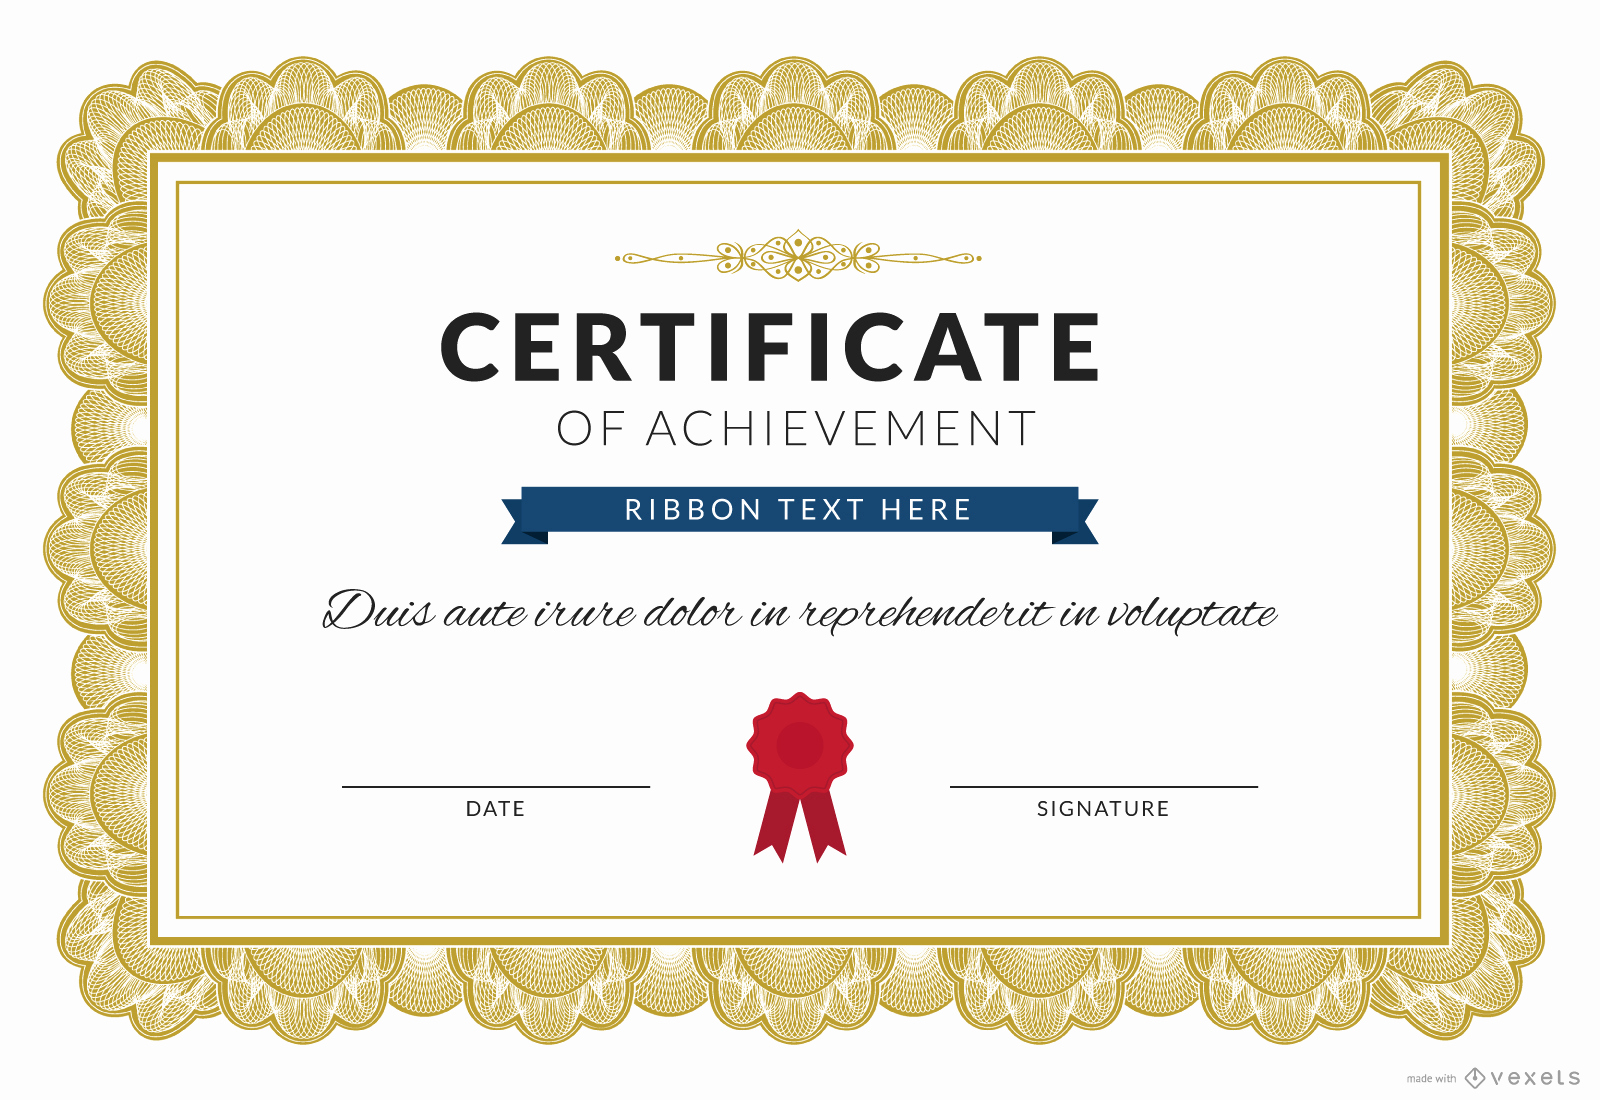 Certificate Of Achievement Template Free Fresh Certificate Of Achievement Maker Editable Design